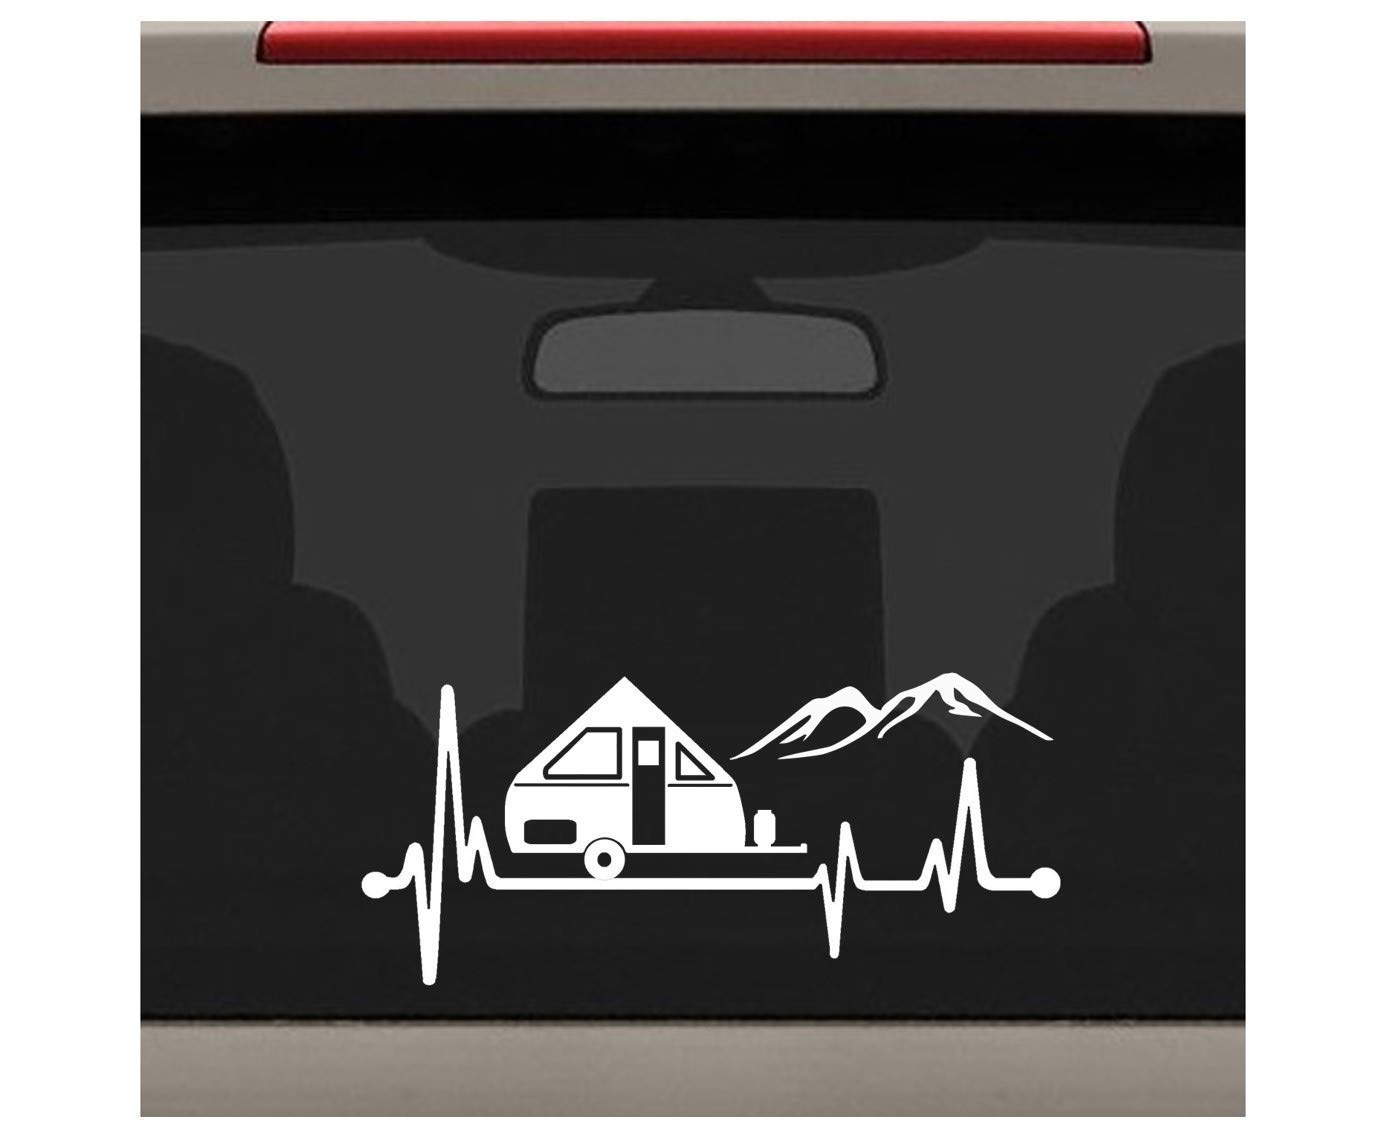 A Frame Camper Heartbeat Lifeline Decal Sticker for Car Window 8.0 Inch BG 541